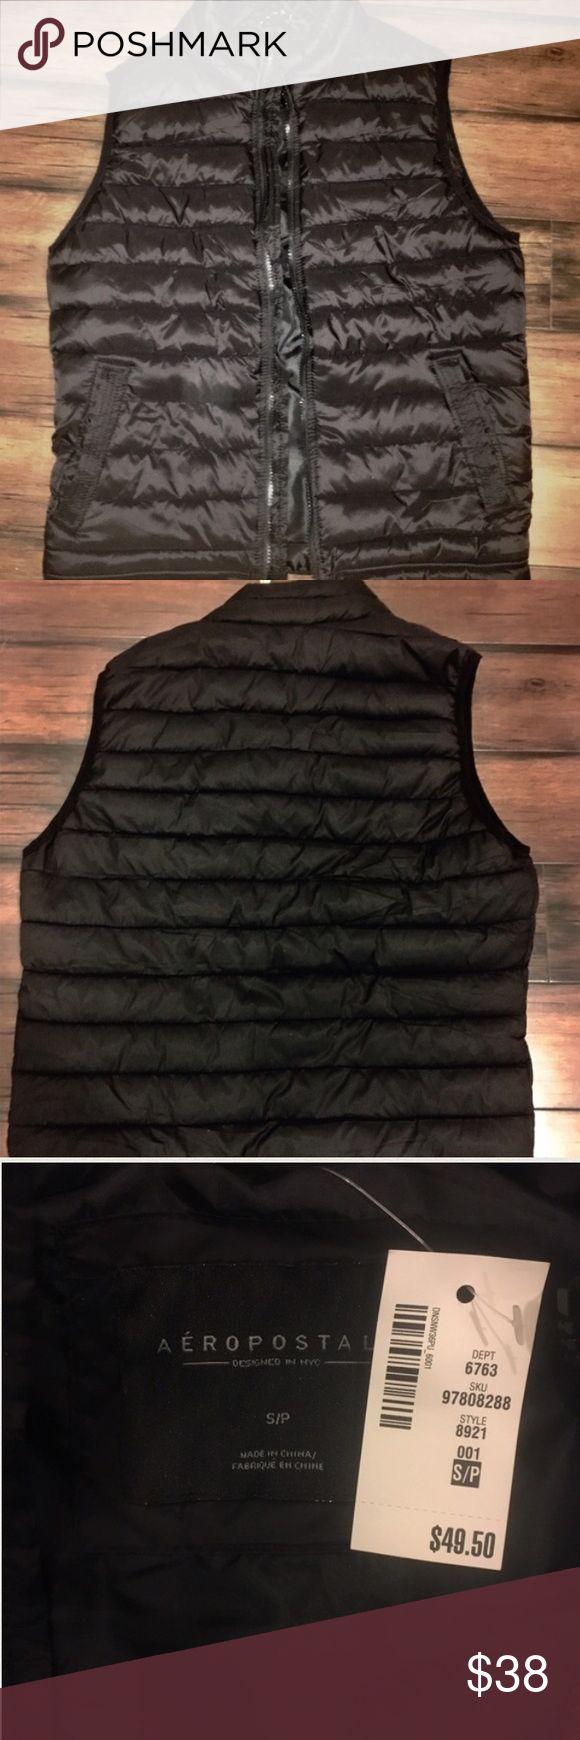 Selling this Black Vest FROM Aeropostale! on Poshmark! My username is: swinscott26. #shopmycloset #poshmark #fashion #shopping #style #forsale #Brandy Melville #Jackets & Blazers